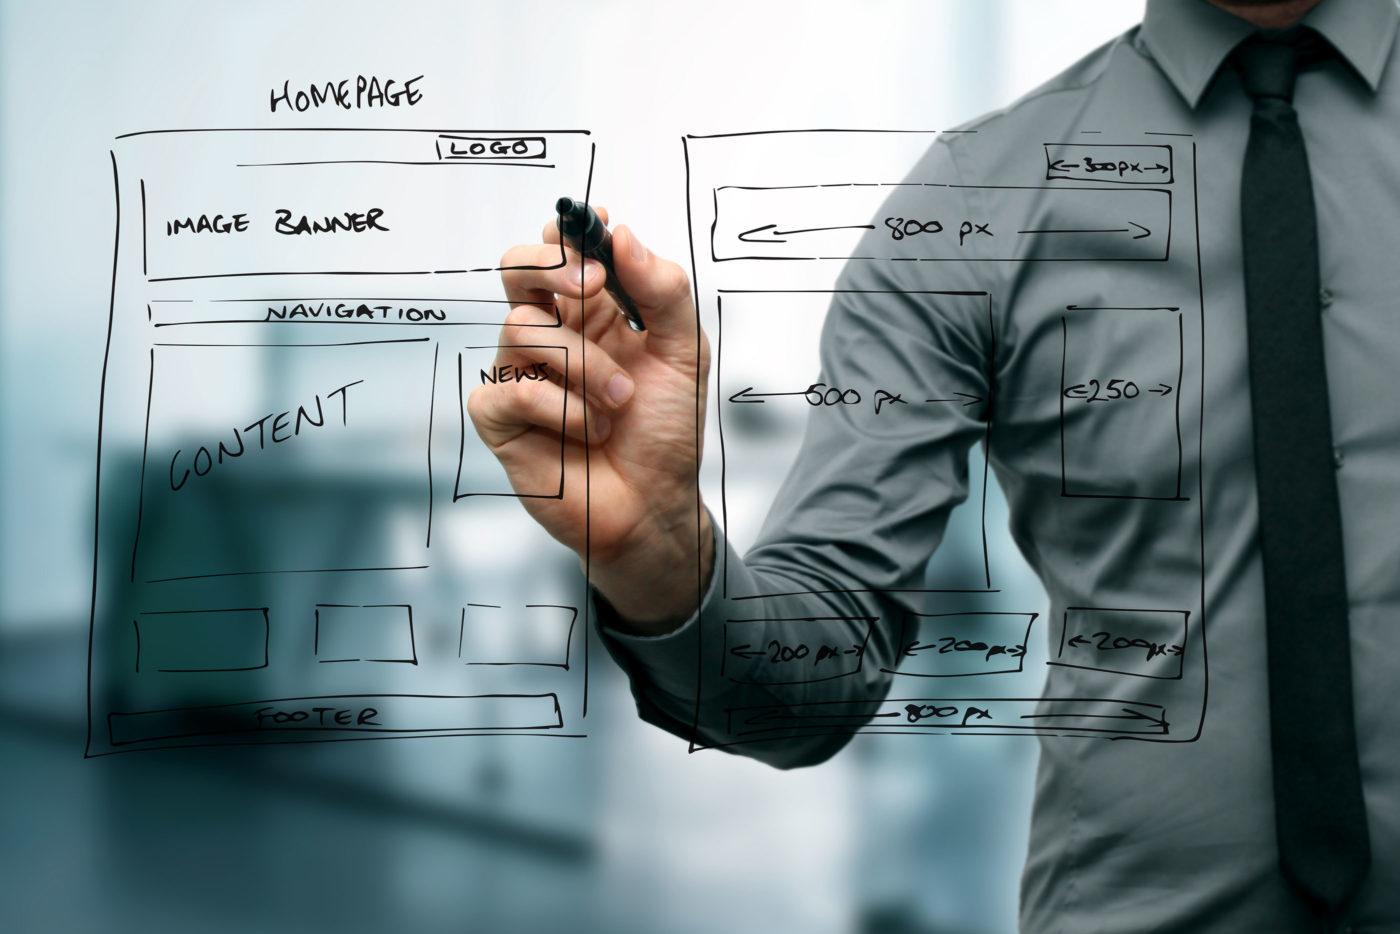 Web Designer vs. Web Developer: What's the Difference?